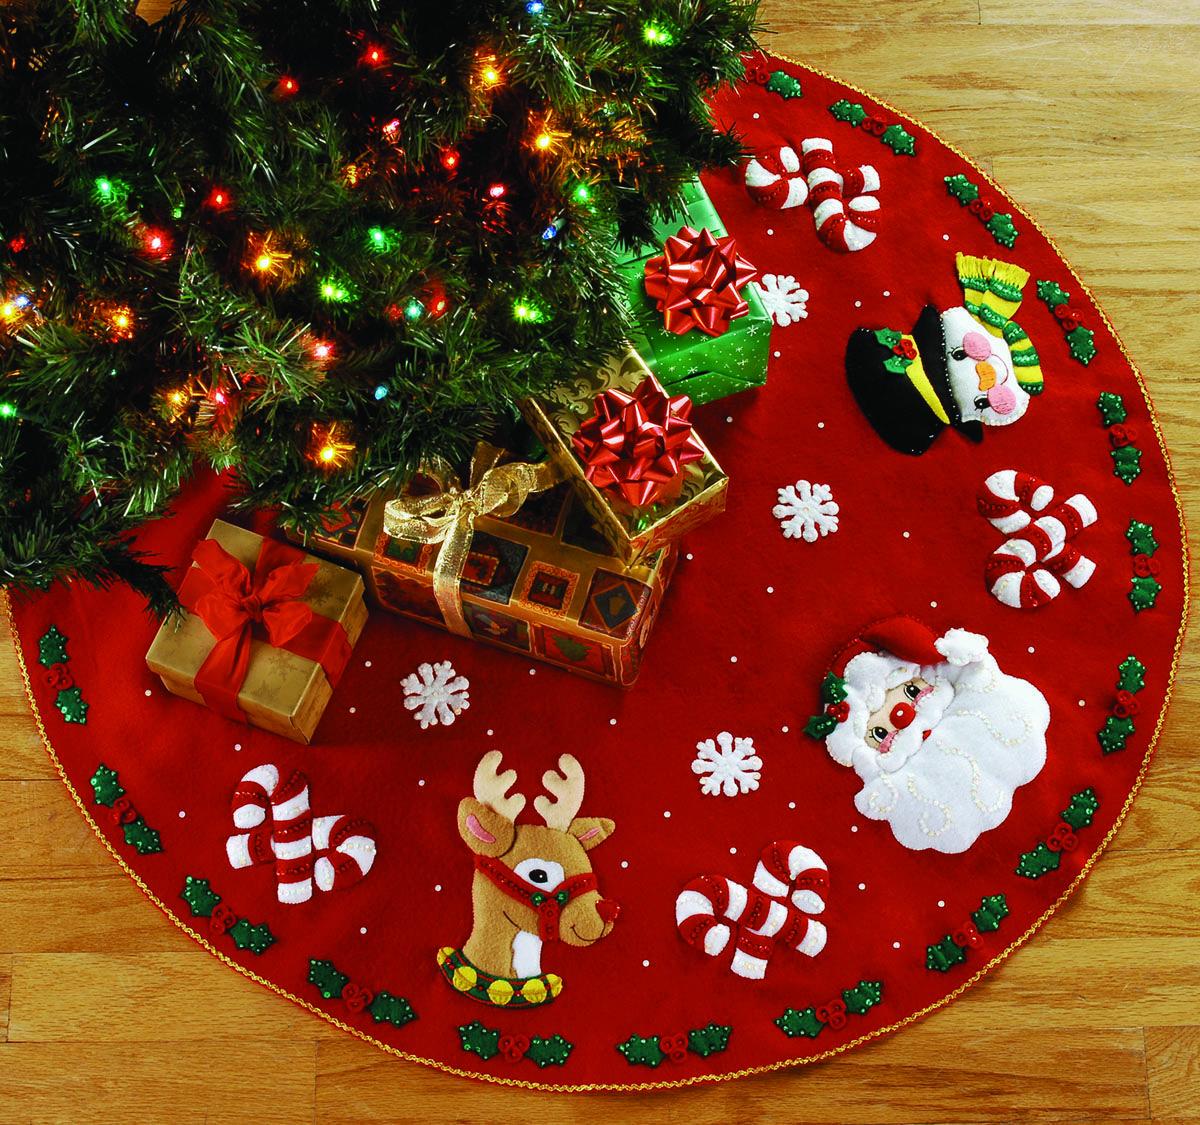 Santa Friends 43 Bucilla Felt Christmas Tree Skirt Kit 86023 Fth Studio International Felt Christmas Tree Christmas Tree Skirts Patterns Felt Christmas